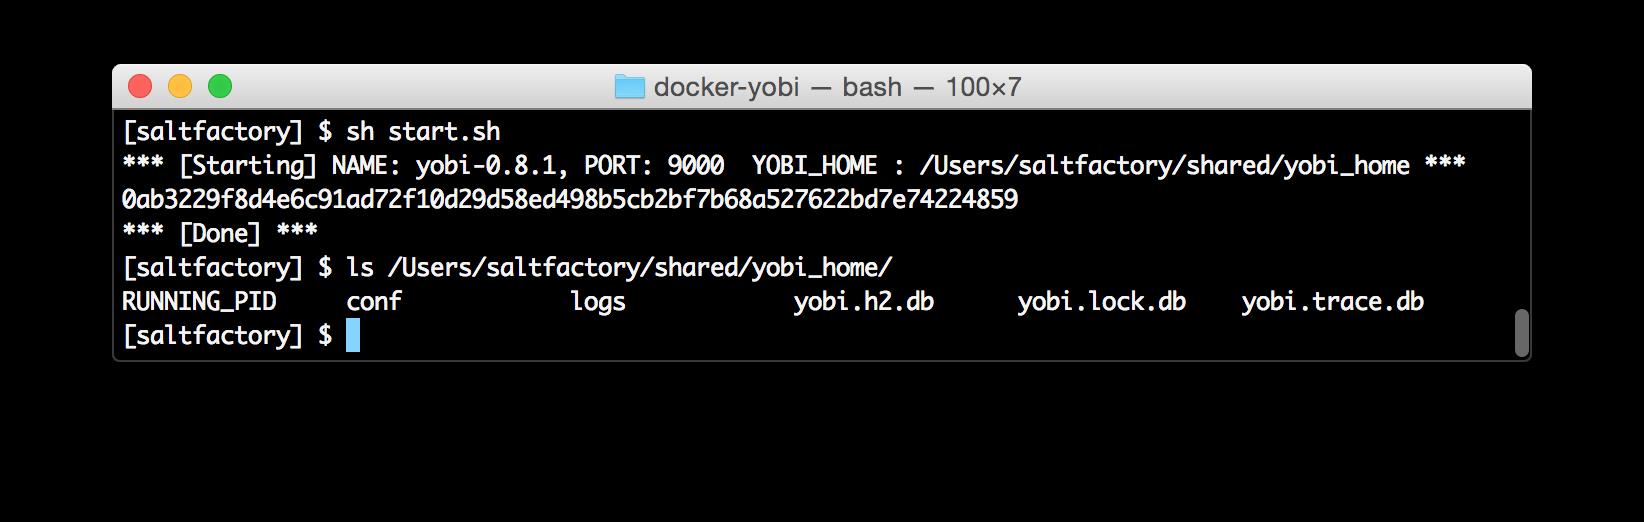 startup docker-yobi